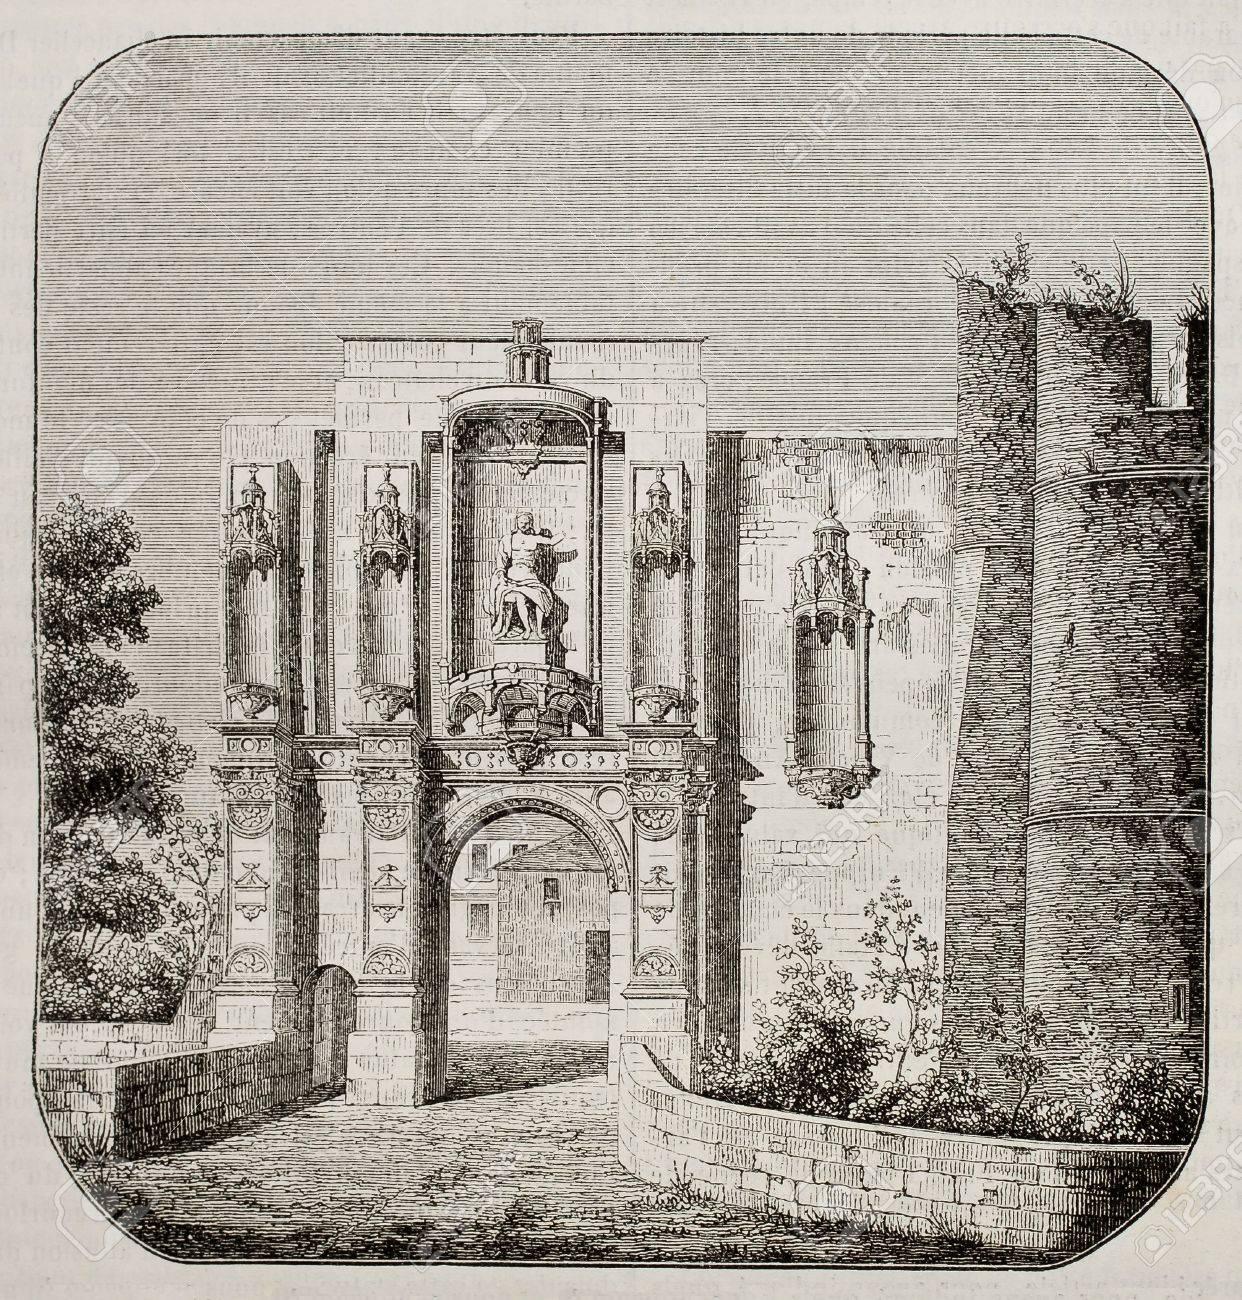 Nantouillet castle entry, France. By unidentified author, published on Magasin Pittoresque, Paris, 1842 Stock Photo - 15270375